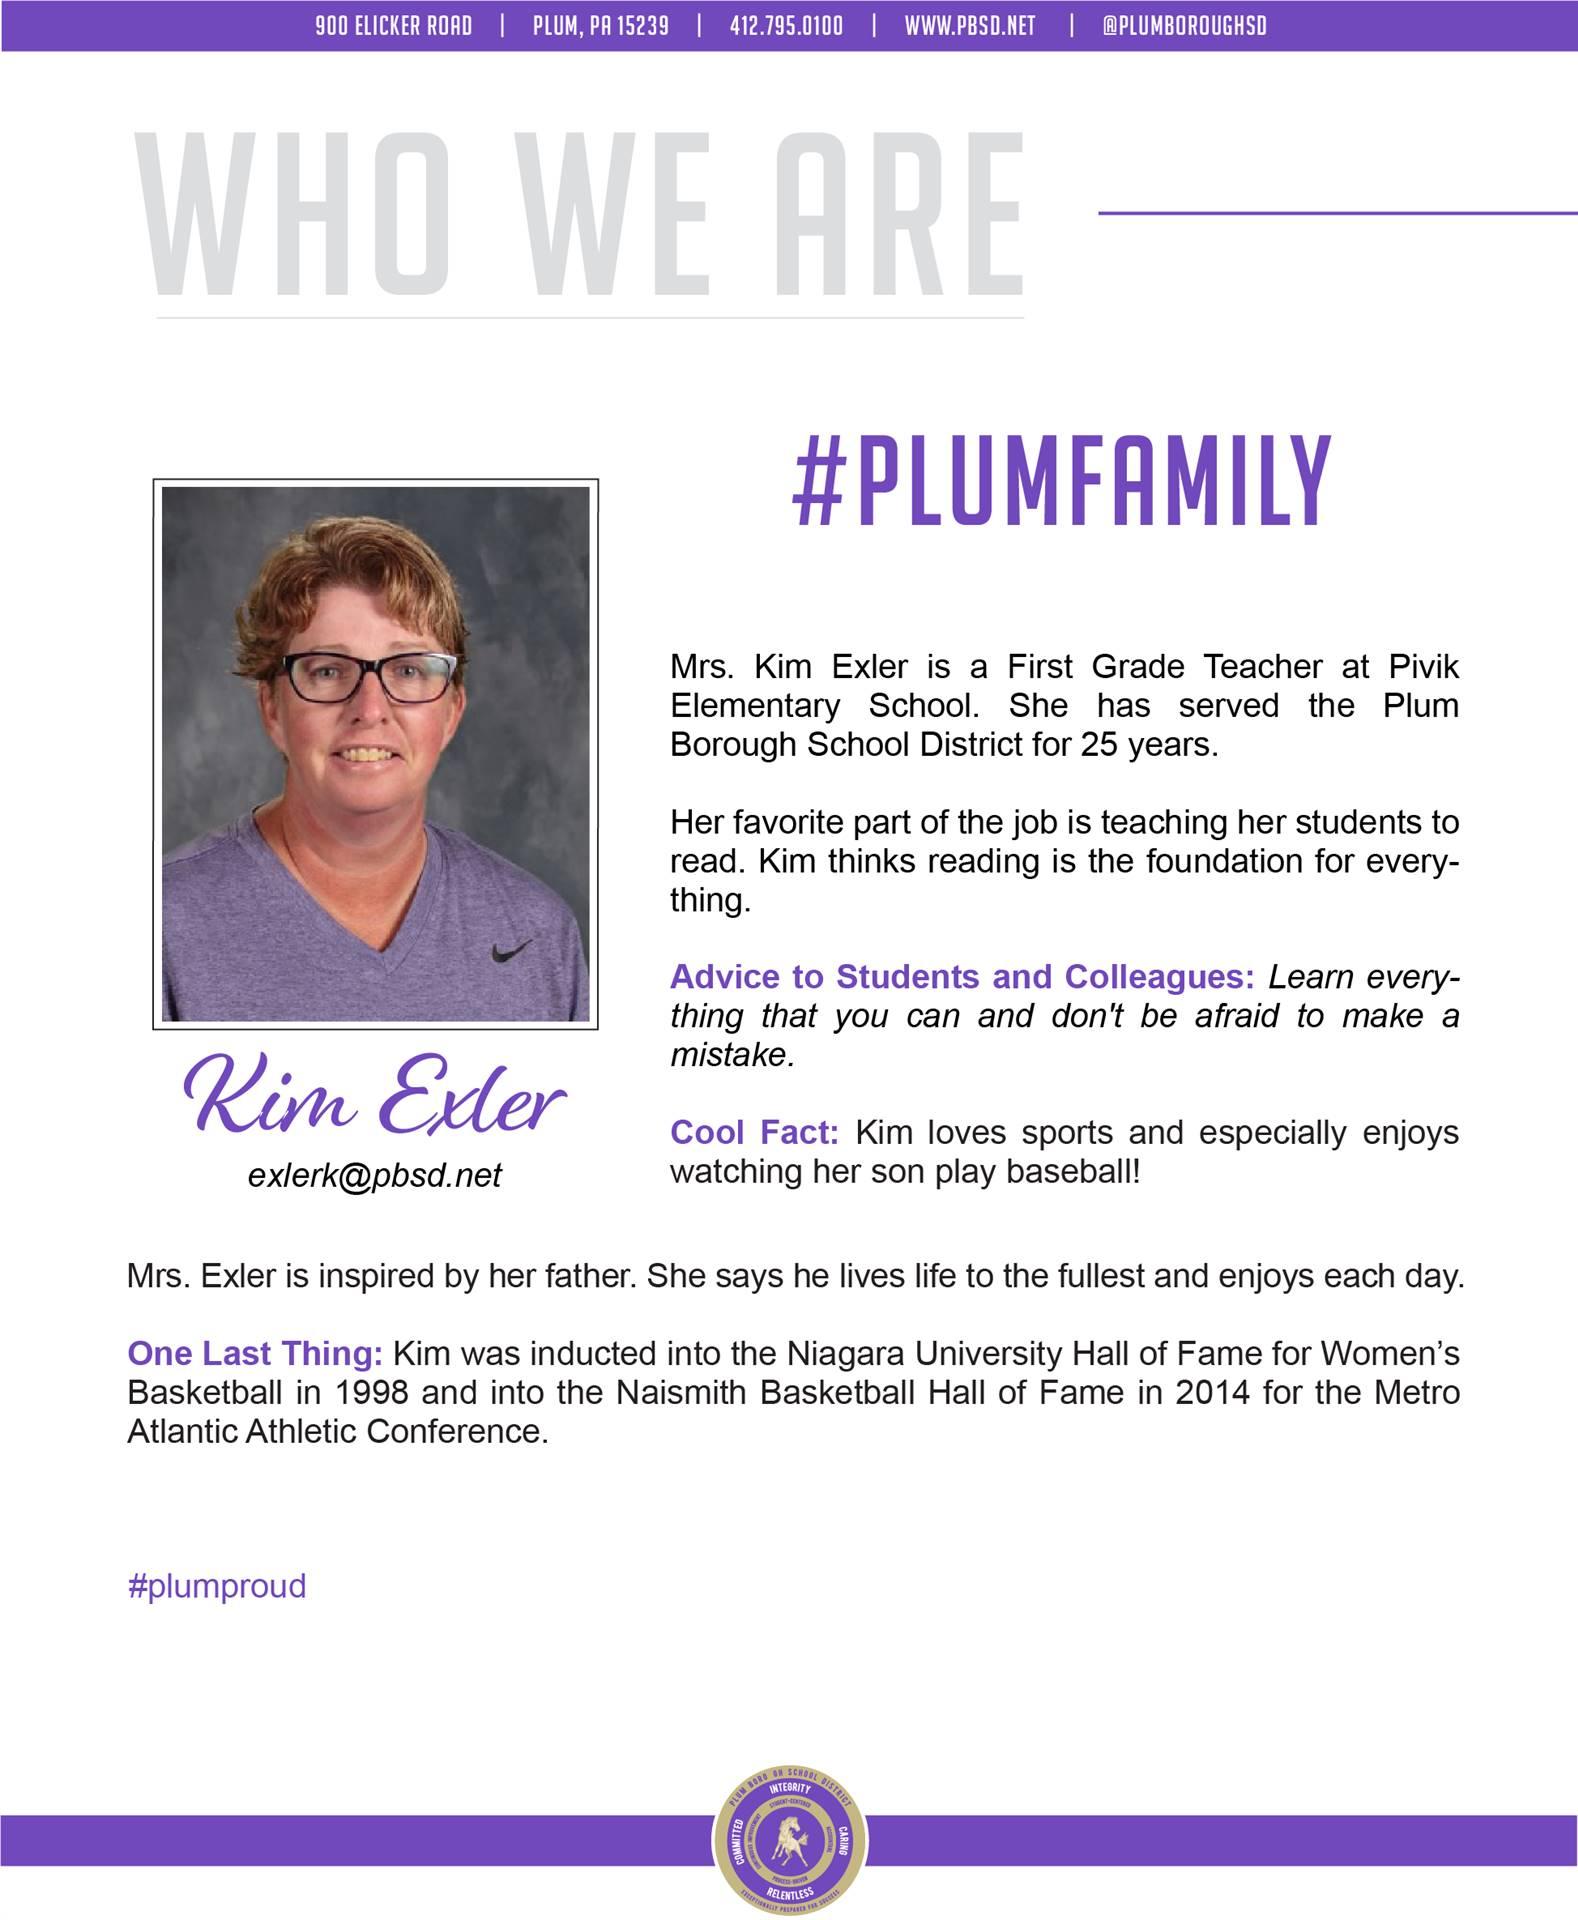 Who We Are Wednesday features Kim Exler.